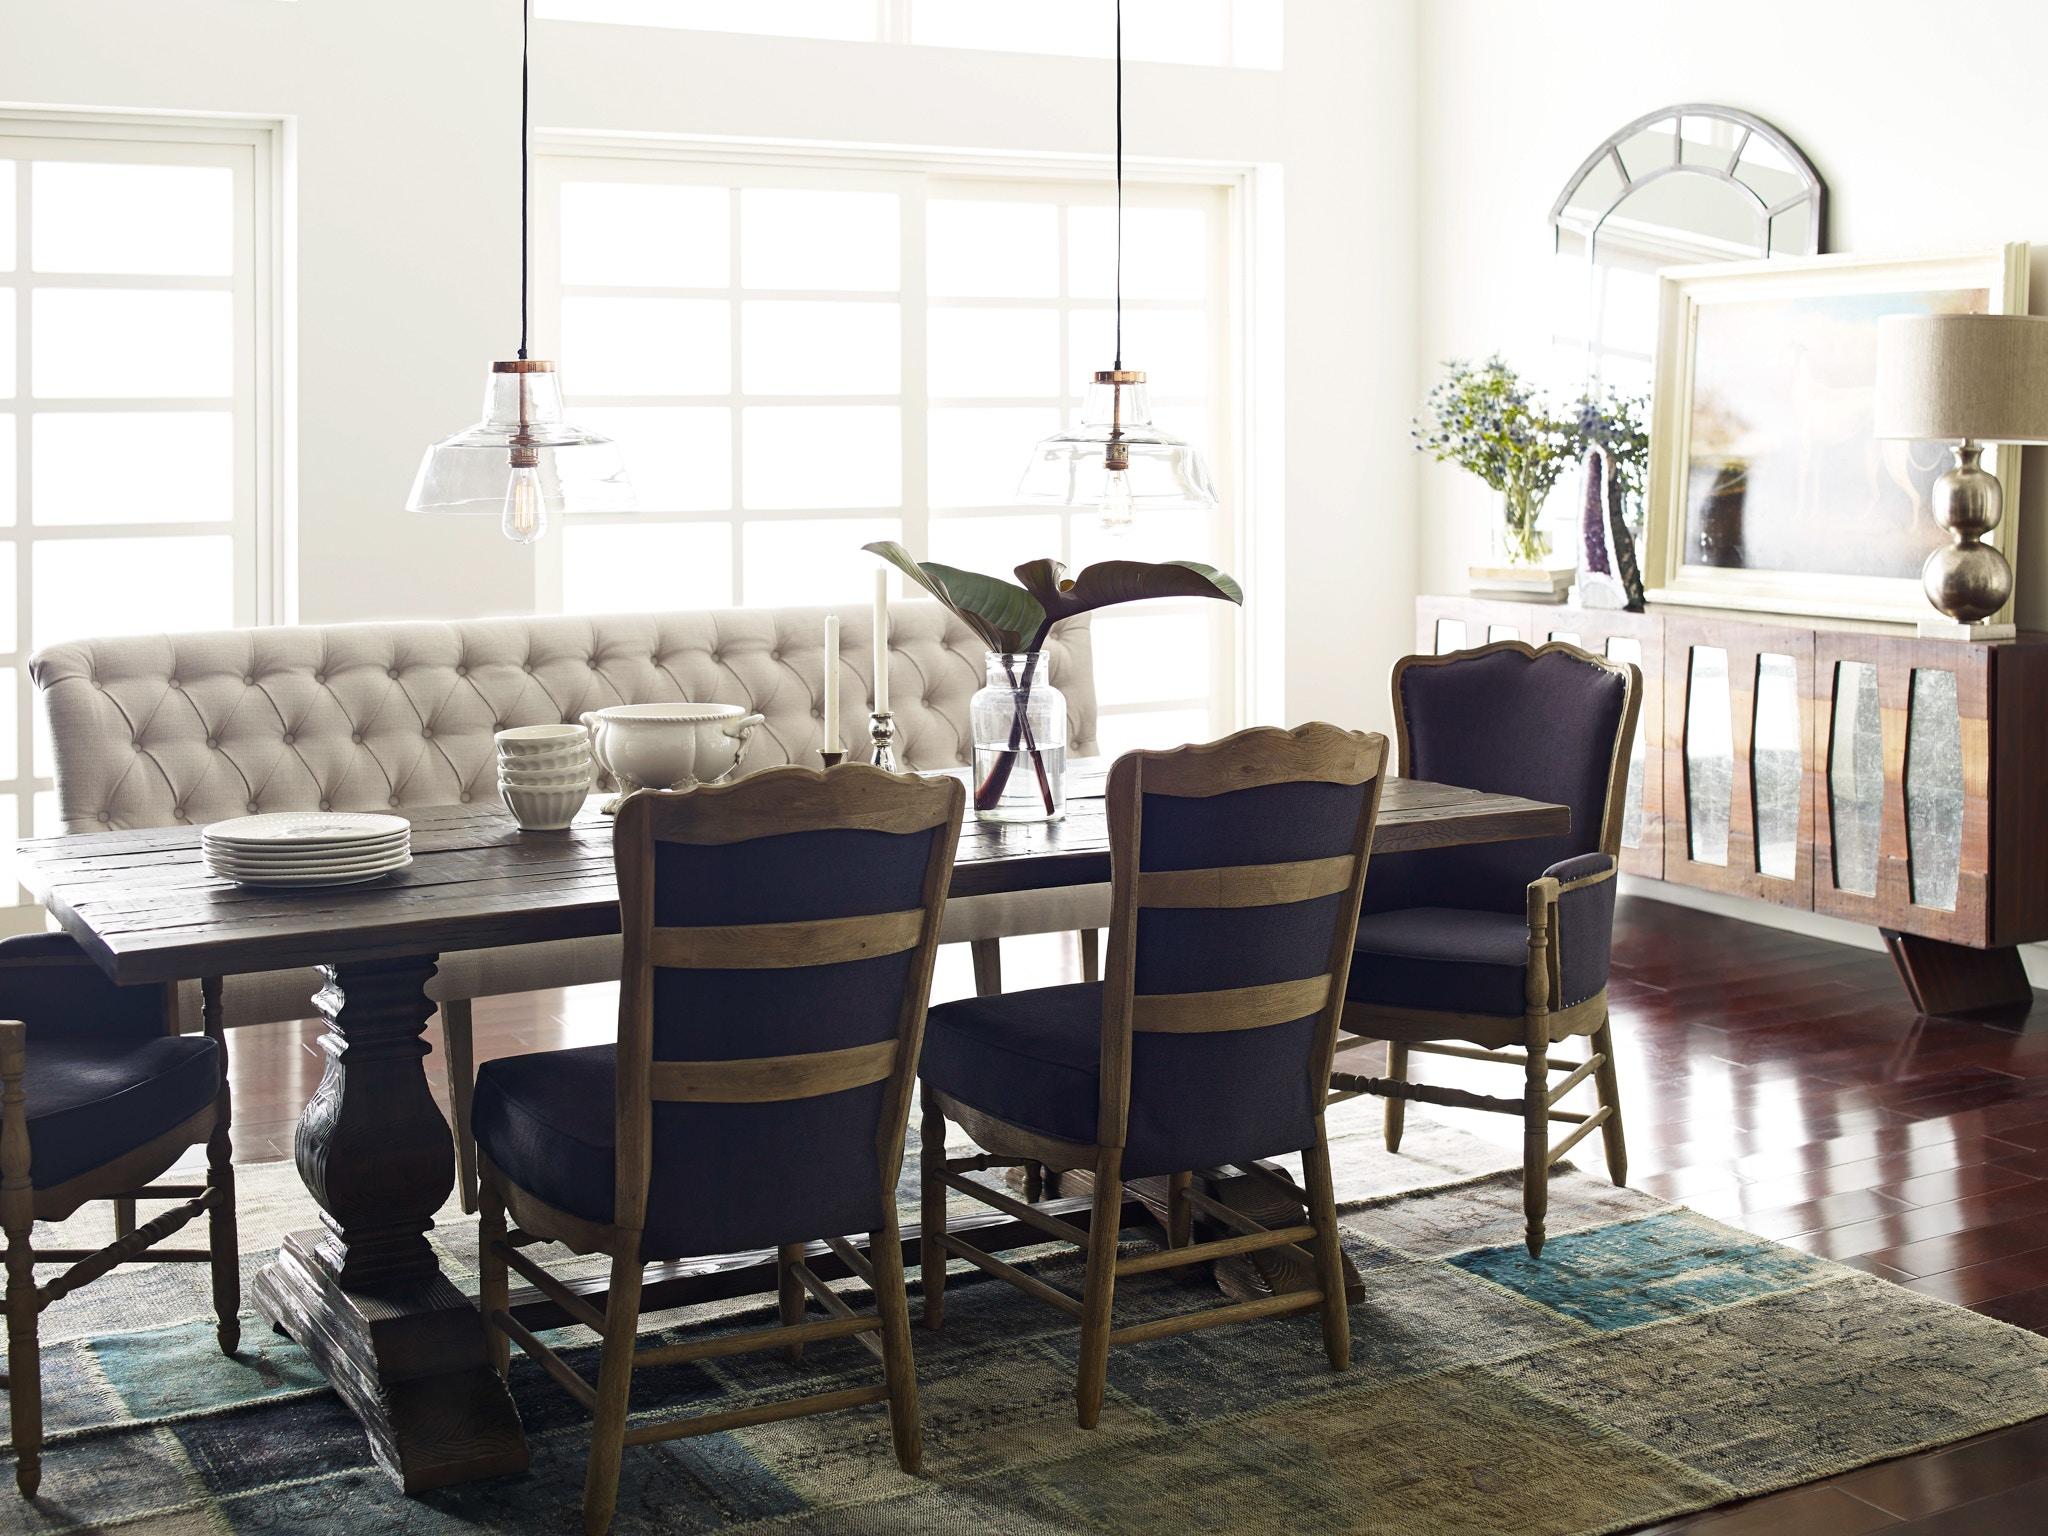 Four Hands Furniture Banquette Light Sand CSD 0042